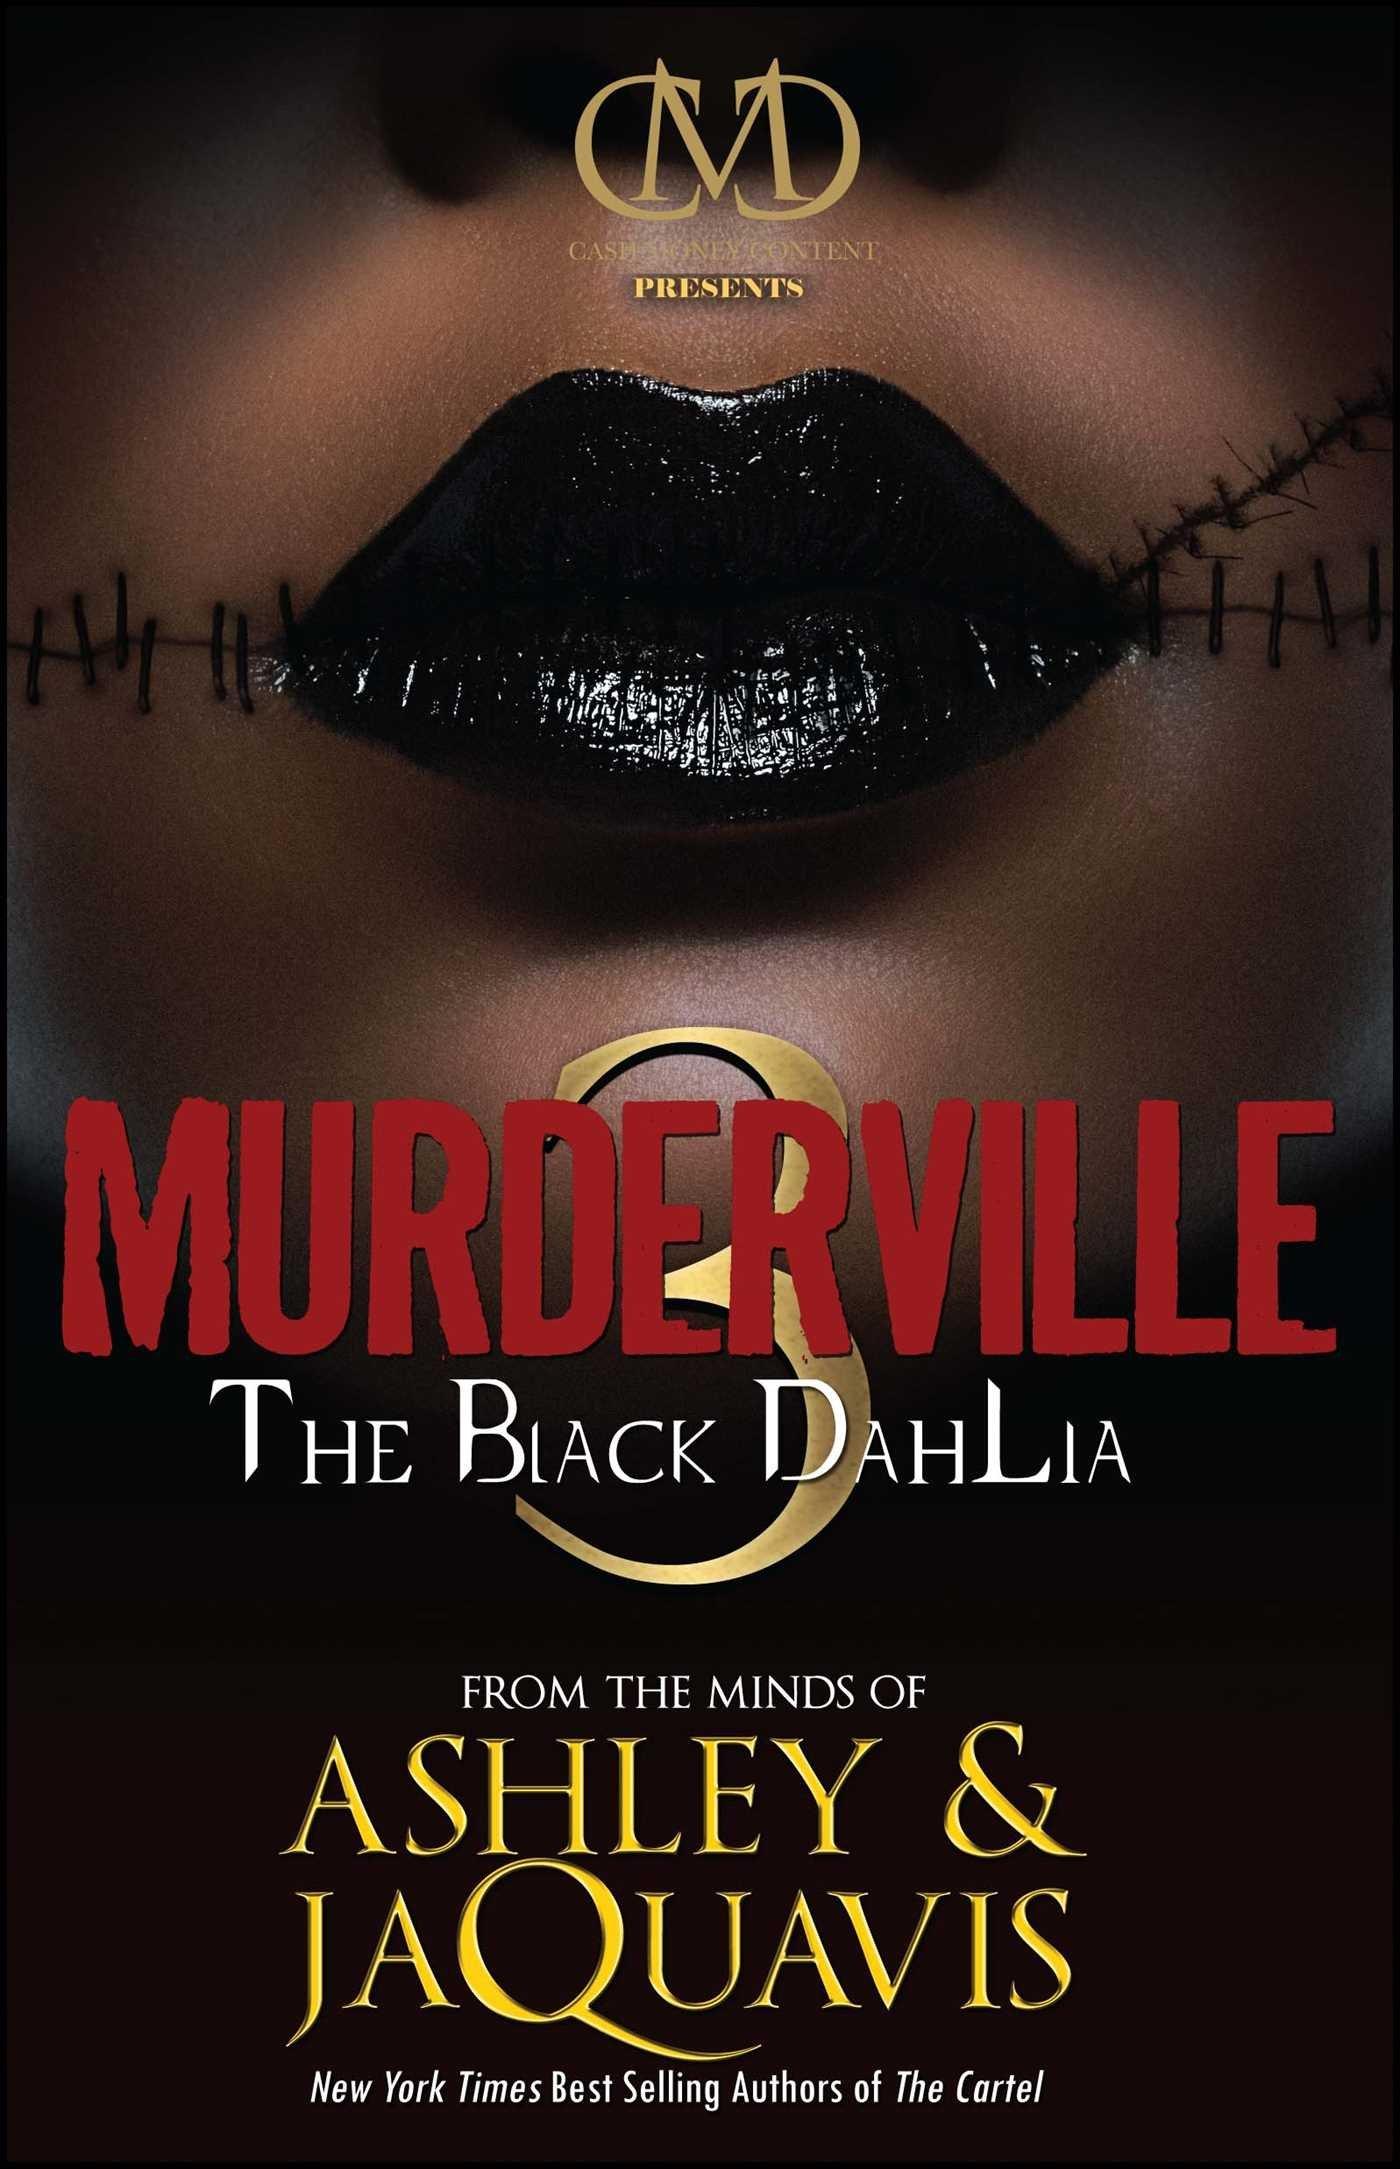 Amazon.com: Murderville 3: The Black Dahlia (9781936399093): Ashley &  JaQuavis: Books